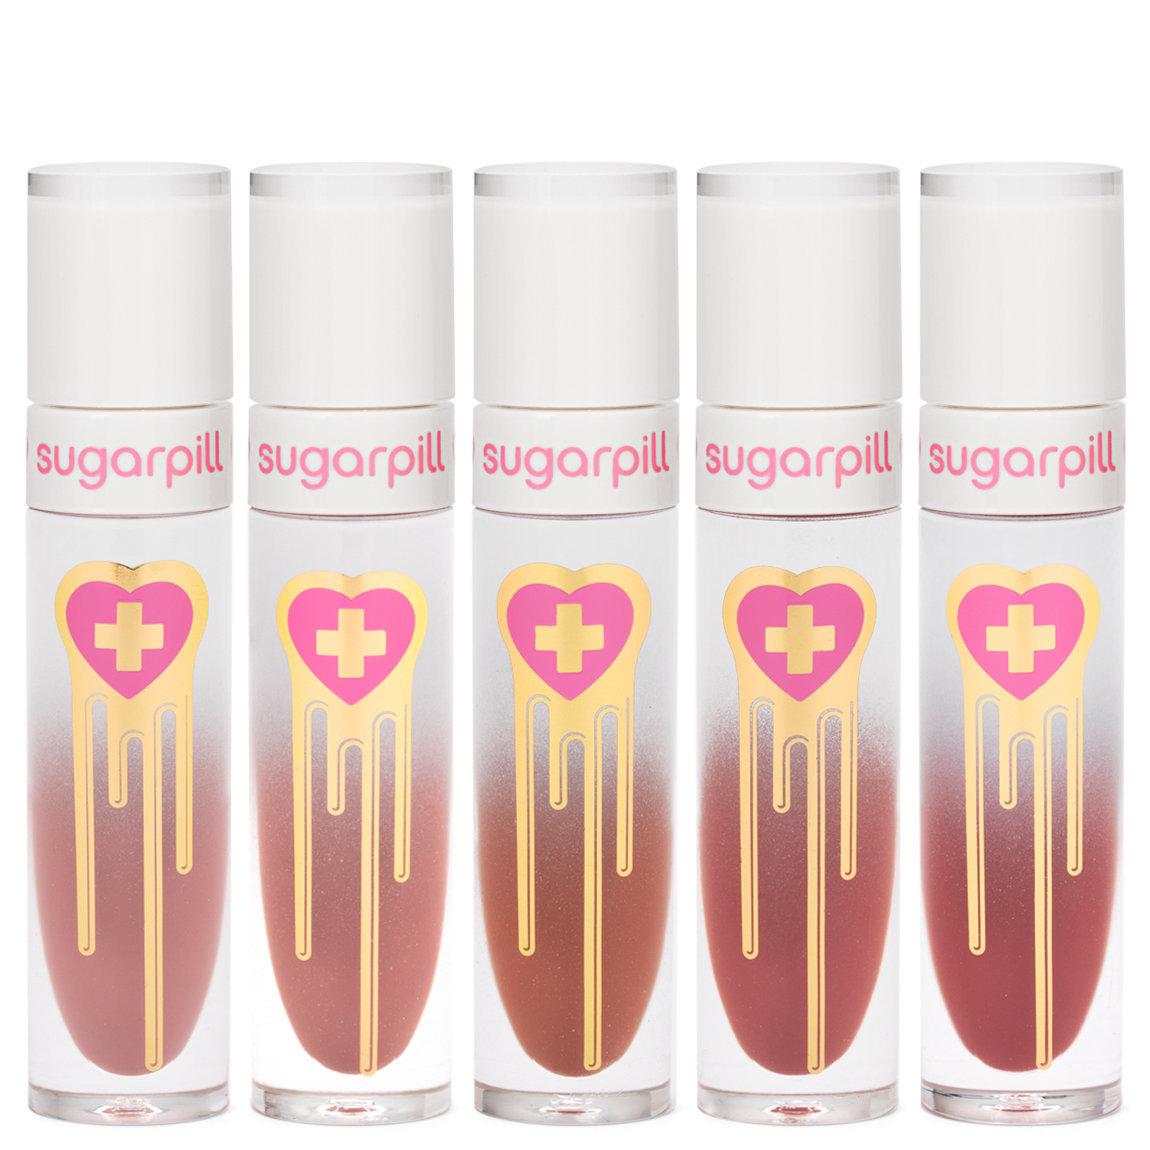 Sugarpill Cosmetics High Tea Liquid Lip Color Collection product swatch.